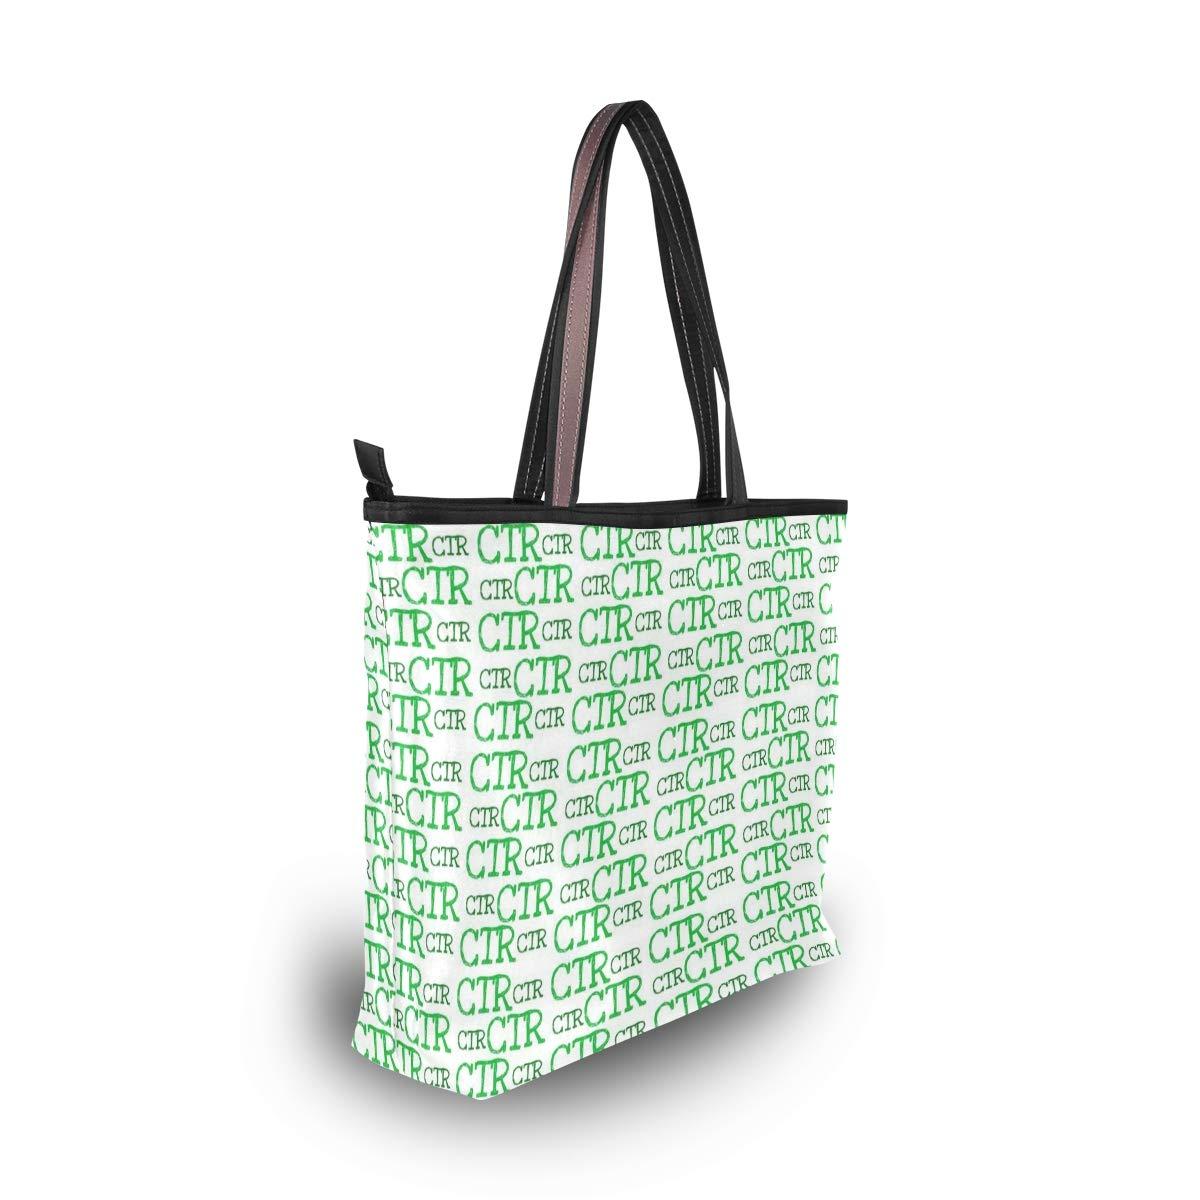 Women Ctr Green Pattern Large Tote Bag Shoulder Bag Lightweight For Gym Hiking Picnic Travel Beach Waterproof Handbag